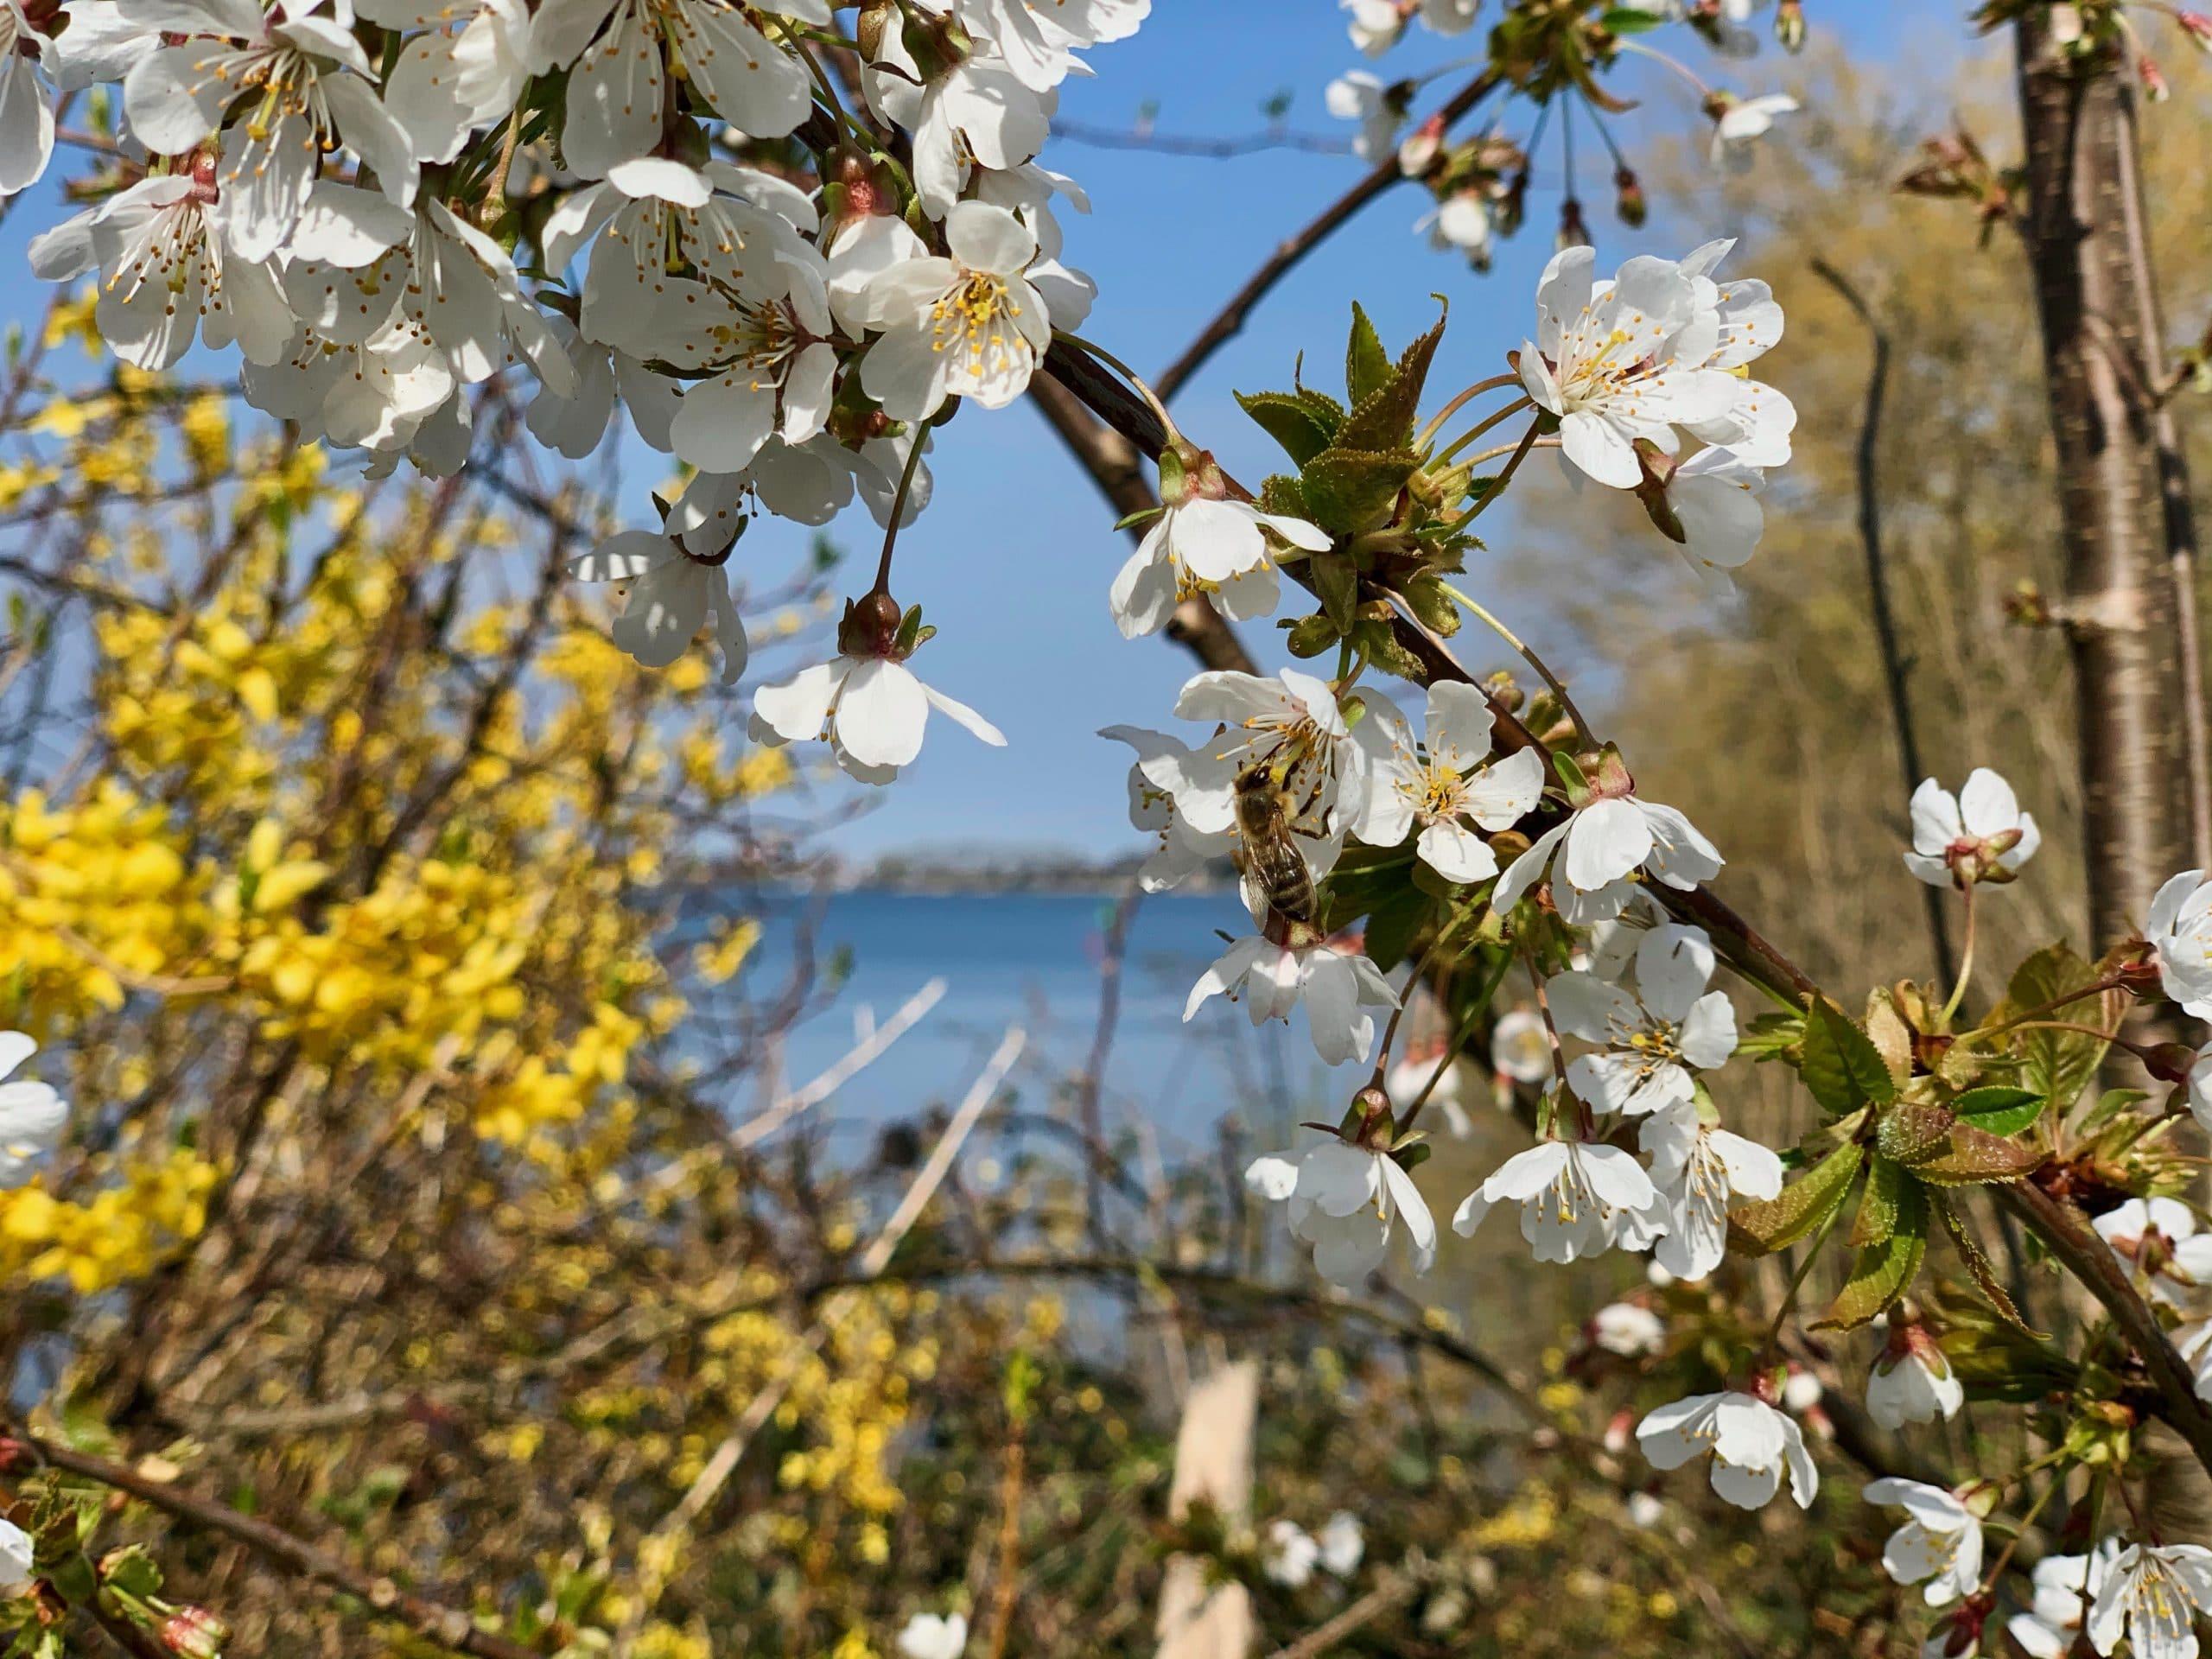 Ostern 2020 an der Schlei Event Nature scaled